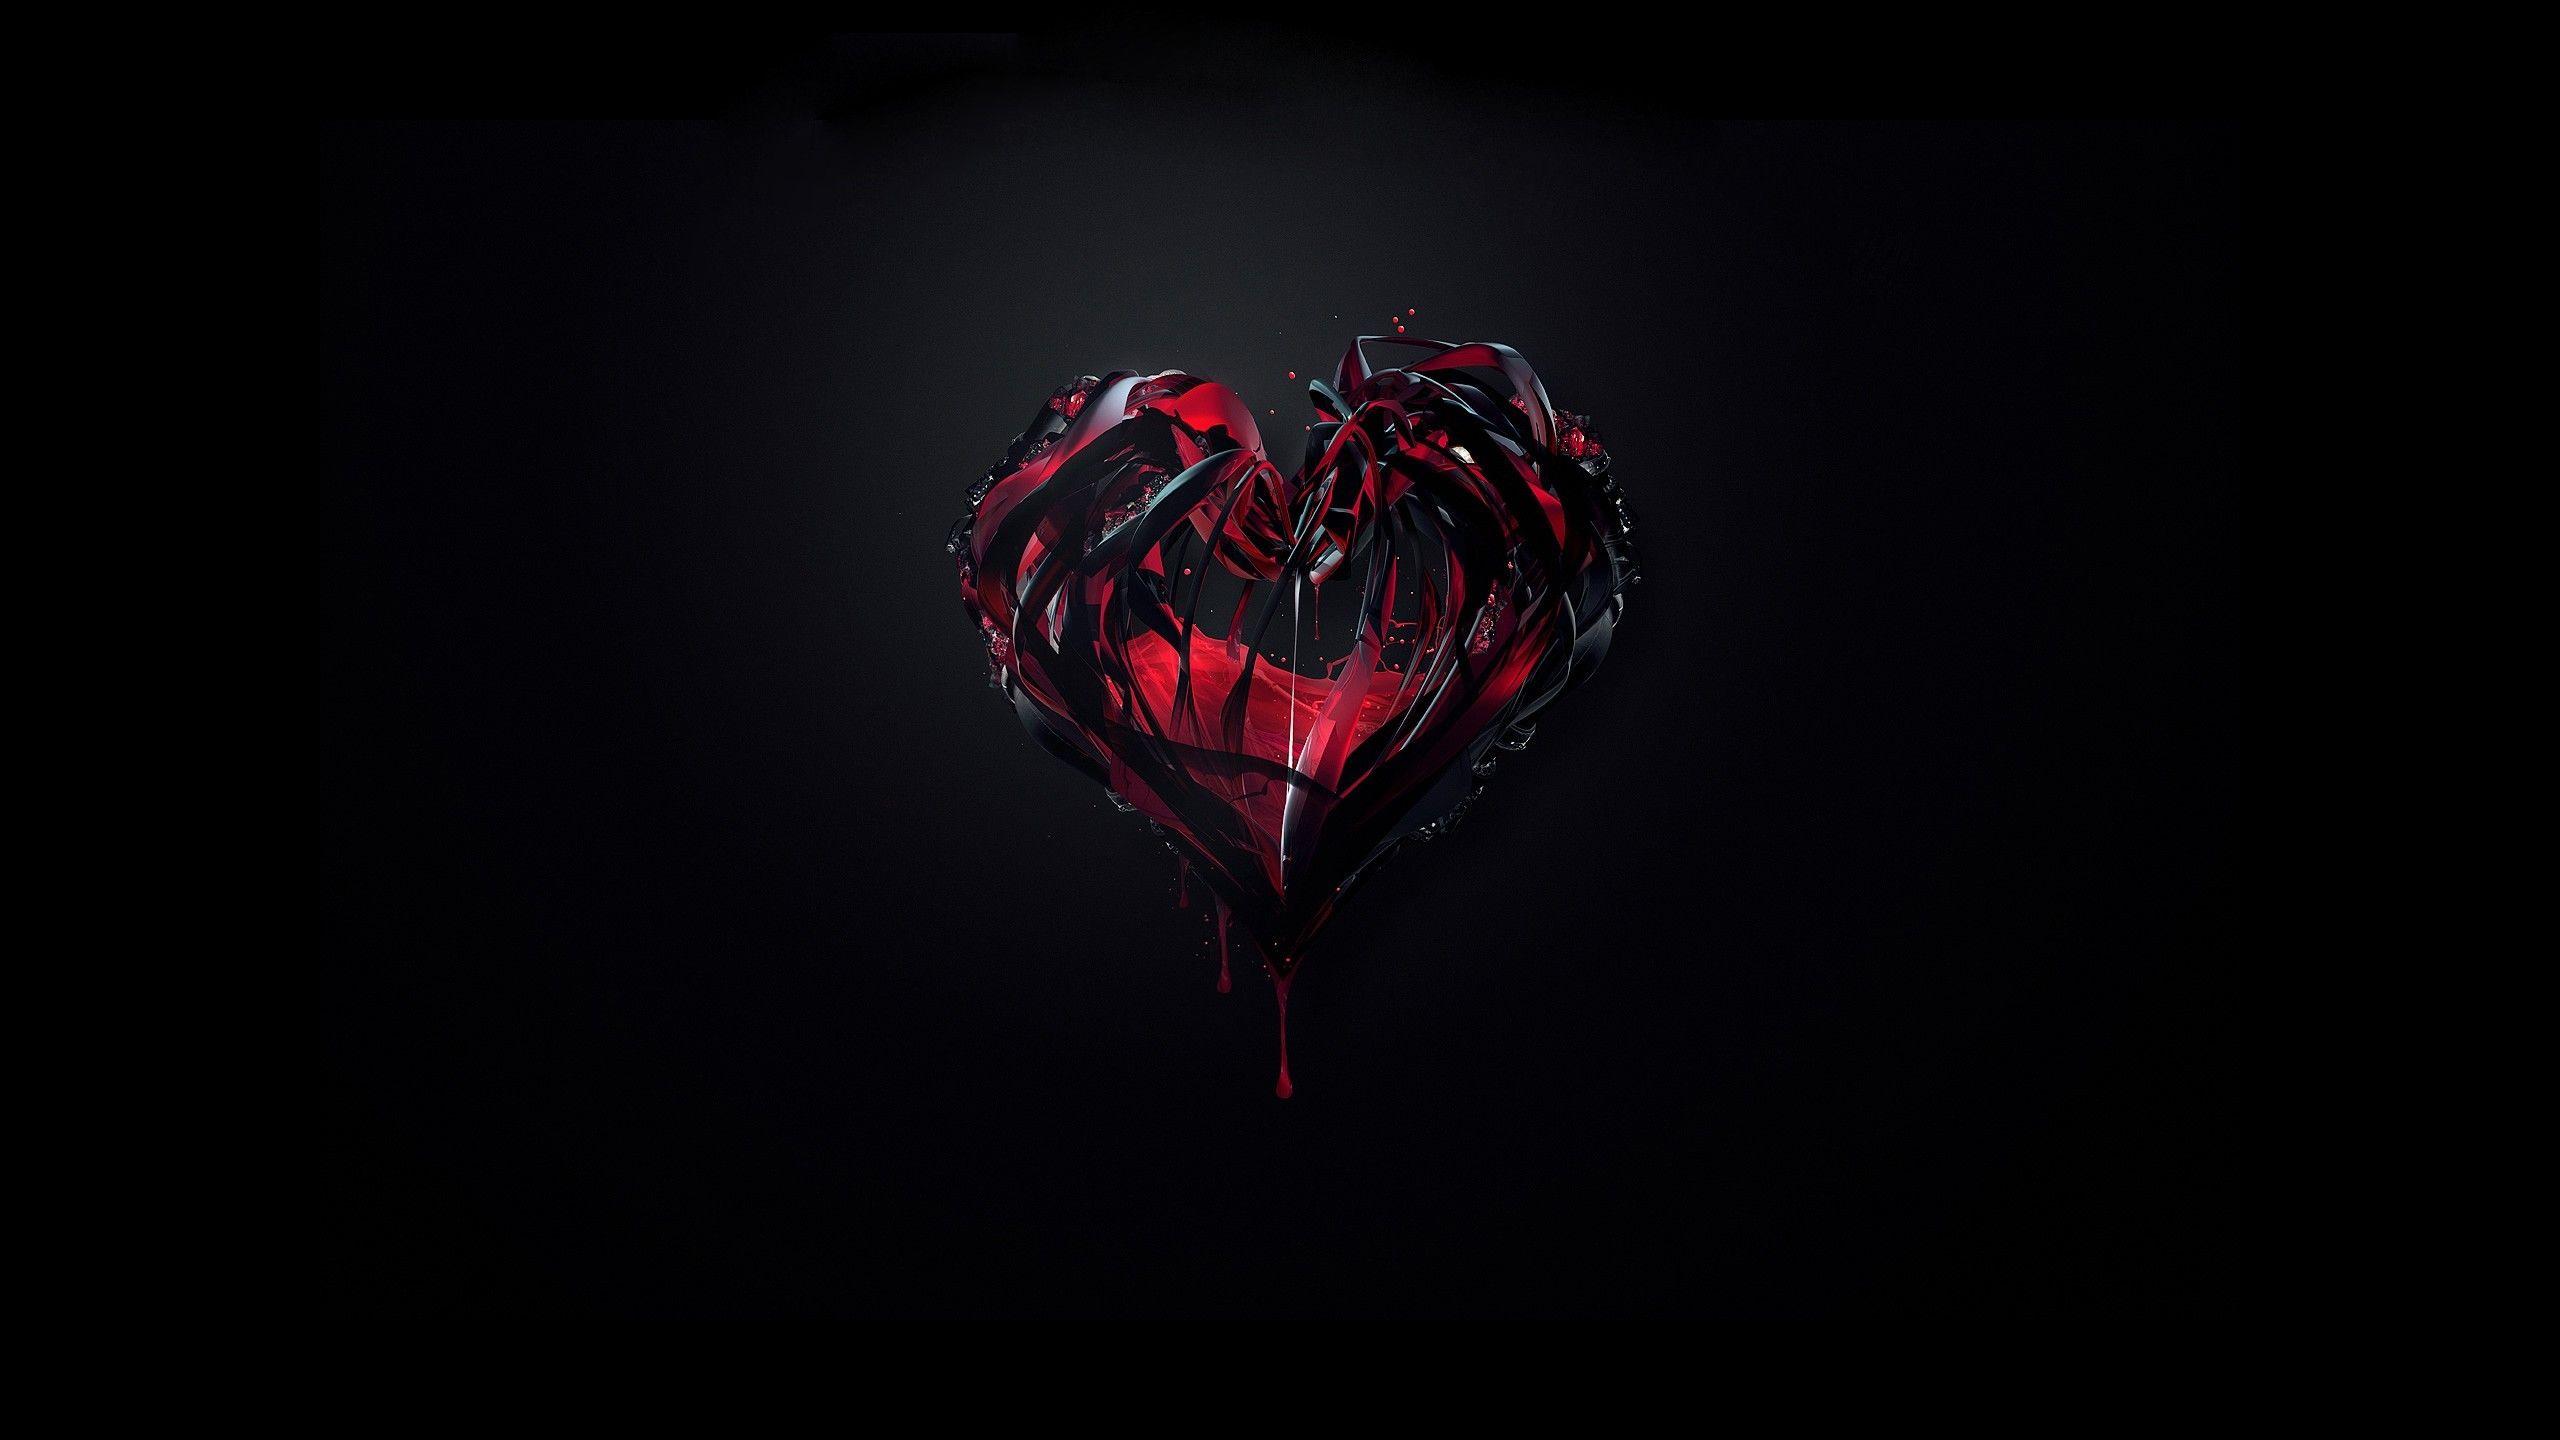 2560x1440 Love Black Wallpaper 2560x1440 Love Black Hearts Heart Wallpaper Heart Wallpaper Hd Love Backgrounds